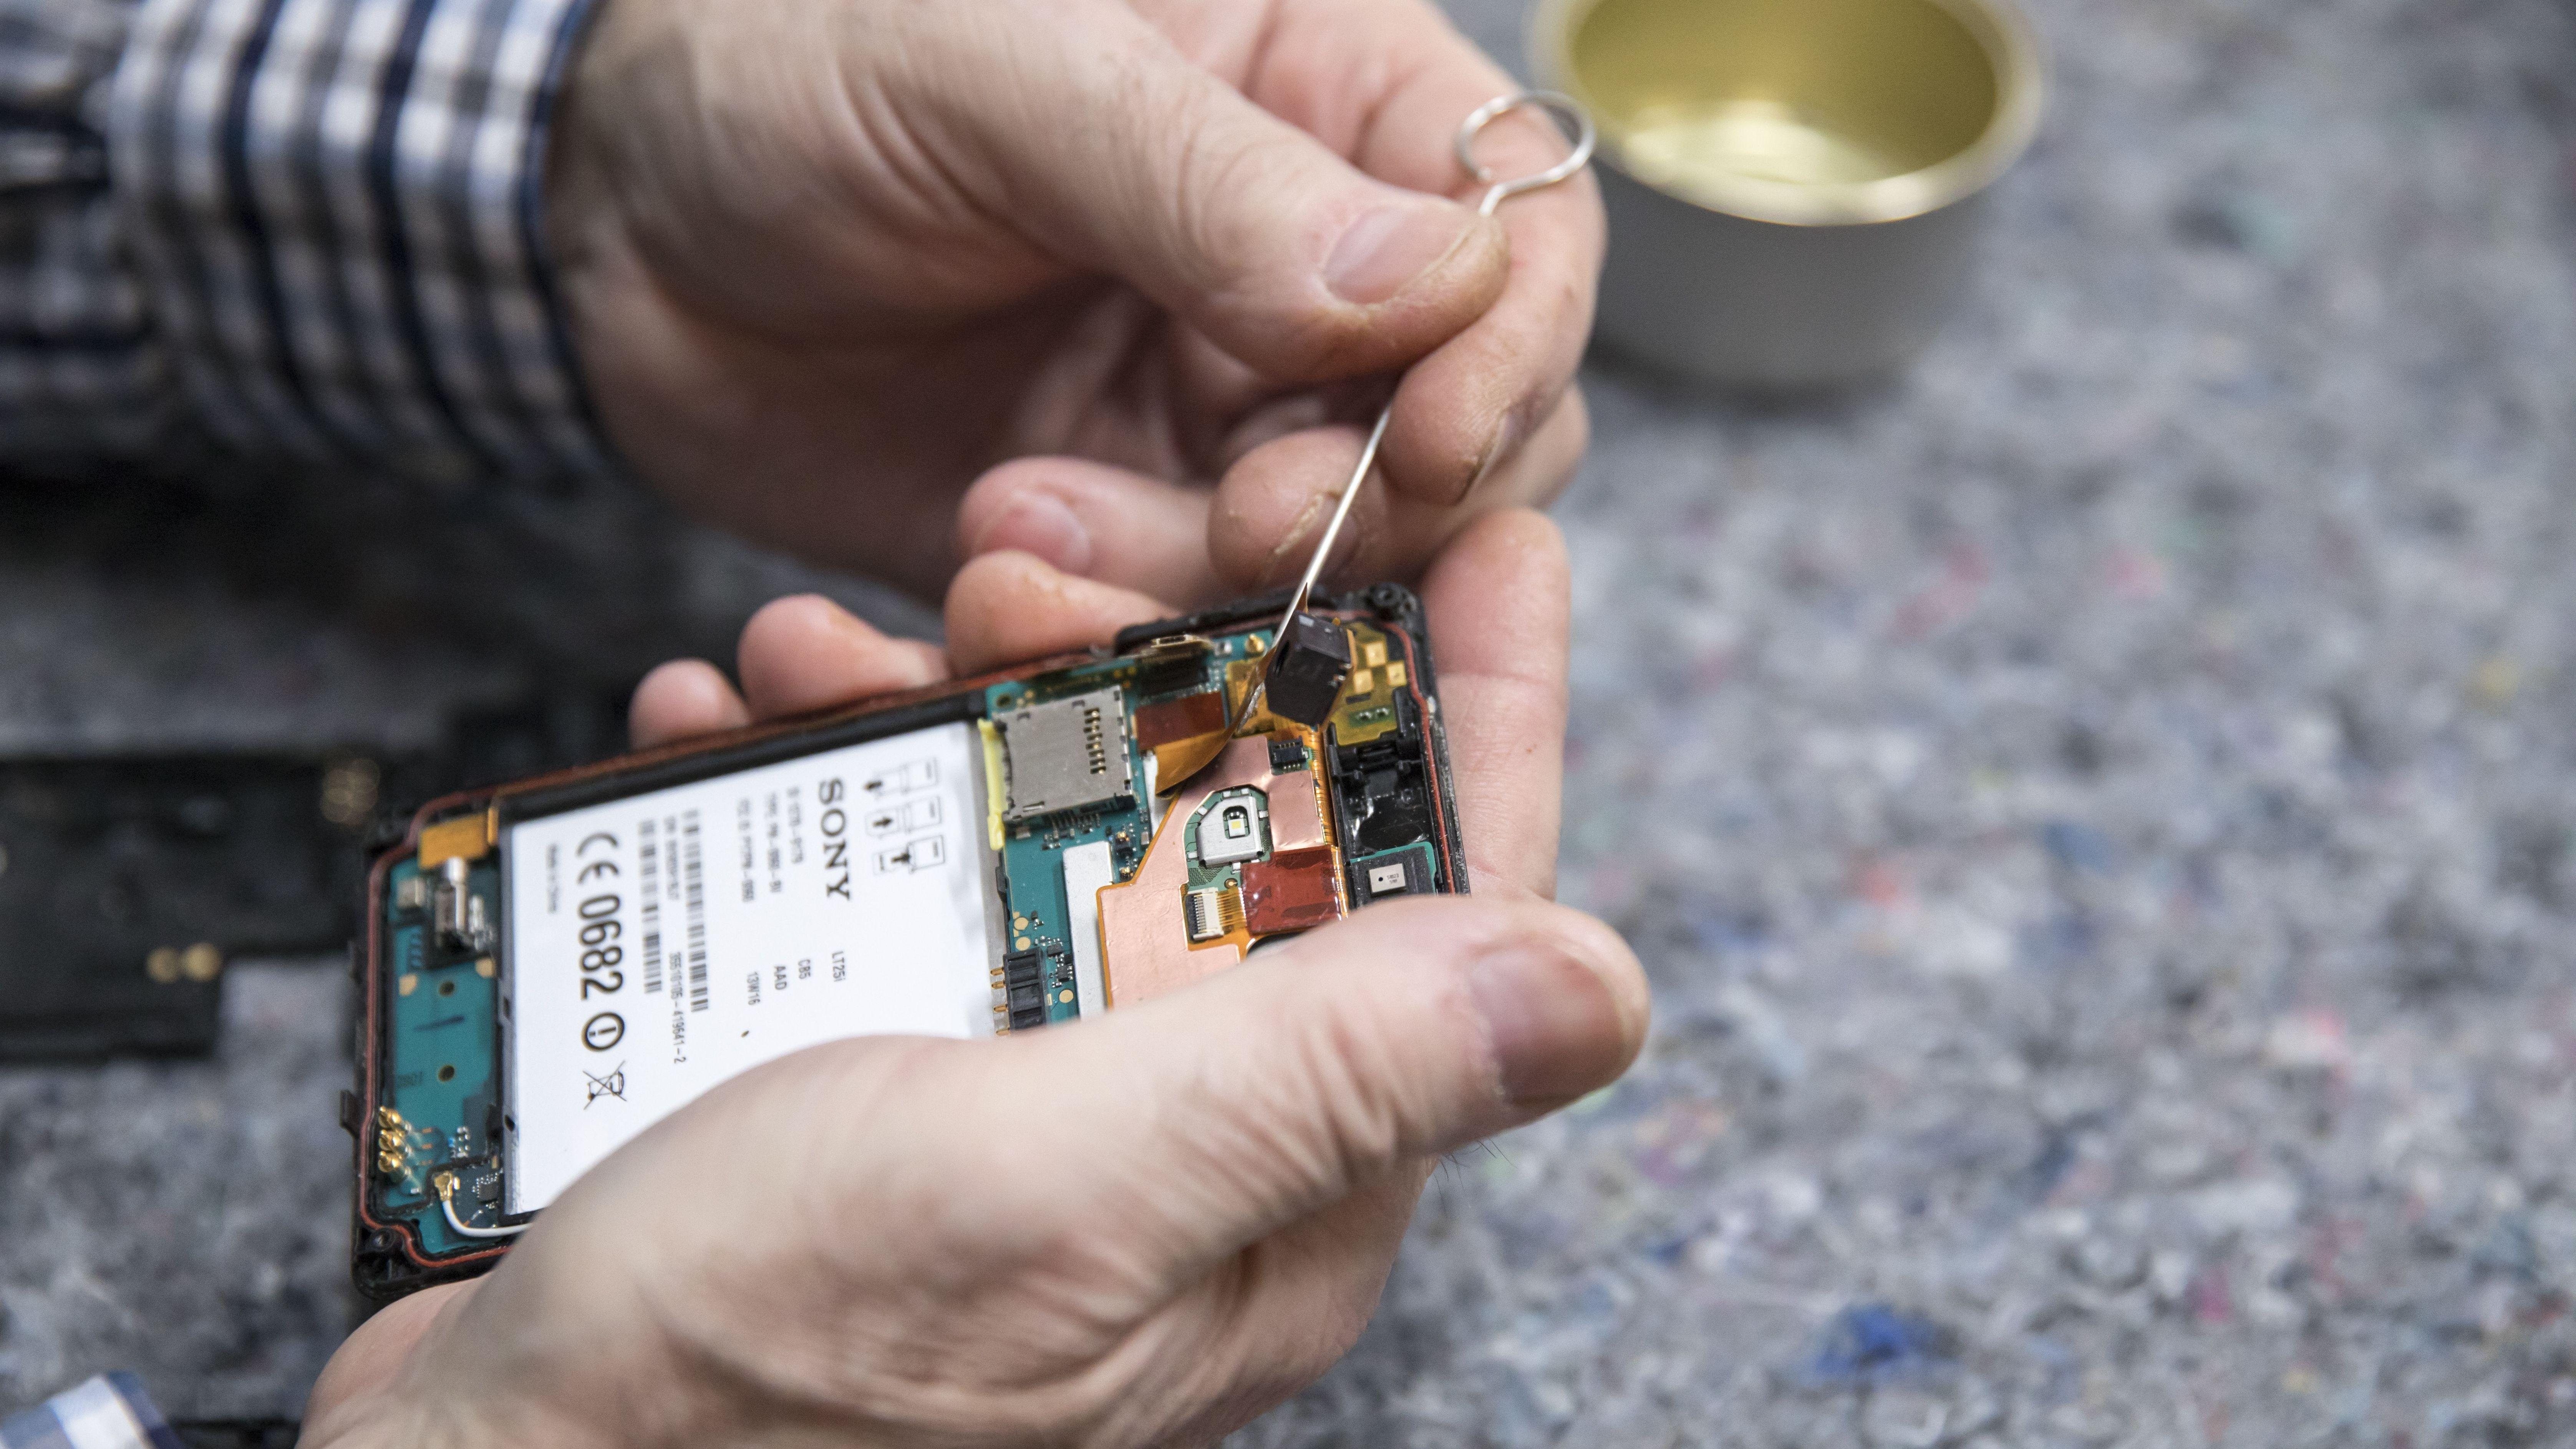 Mann repariert Smartphone.